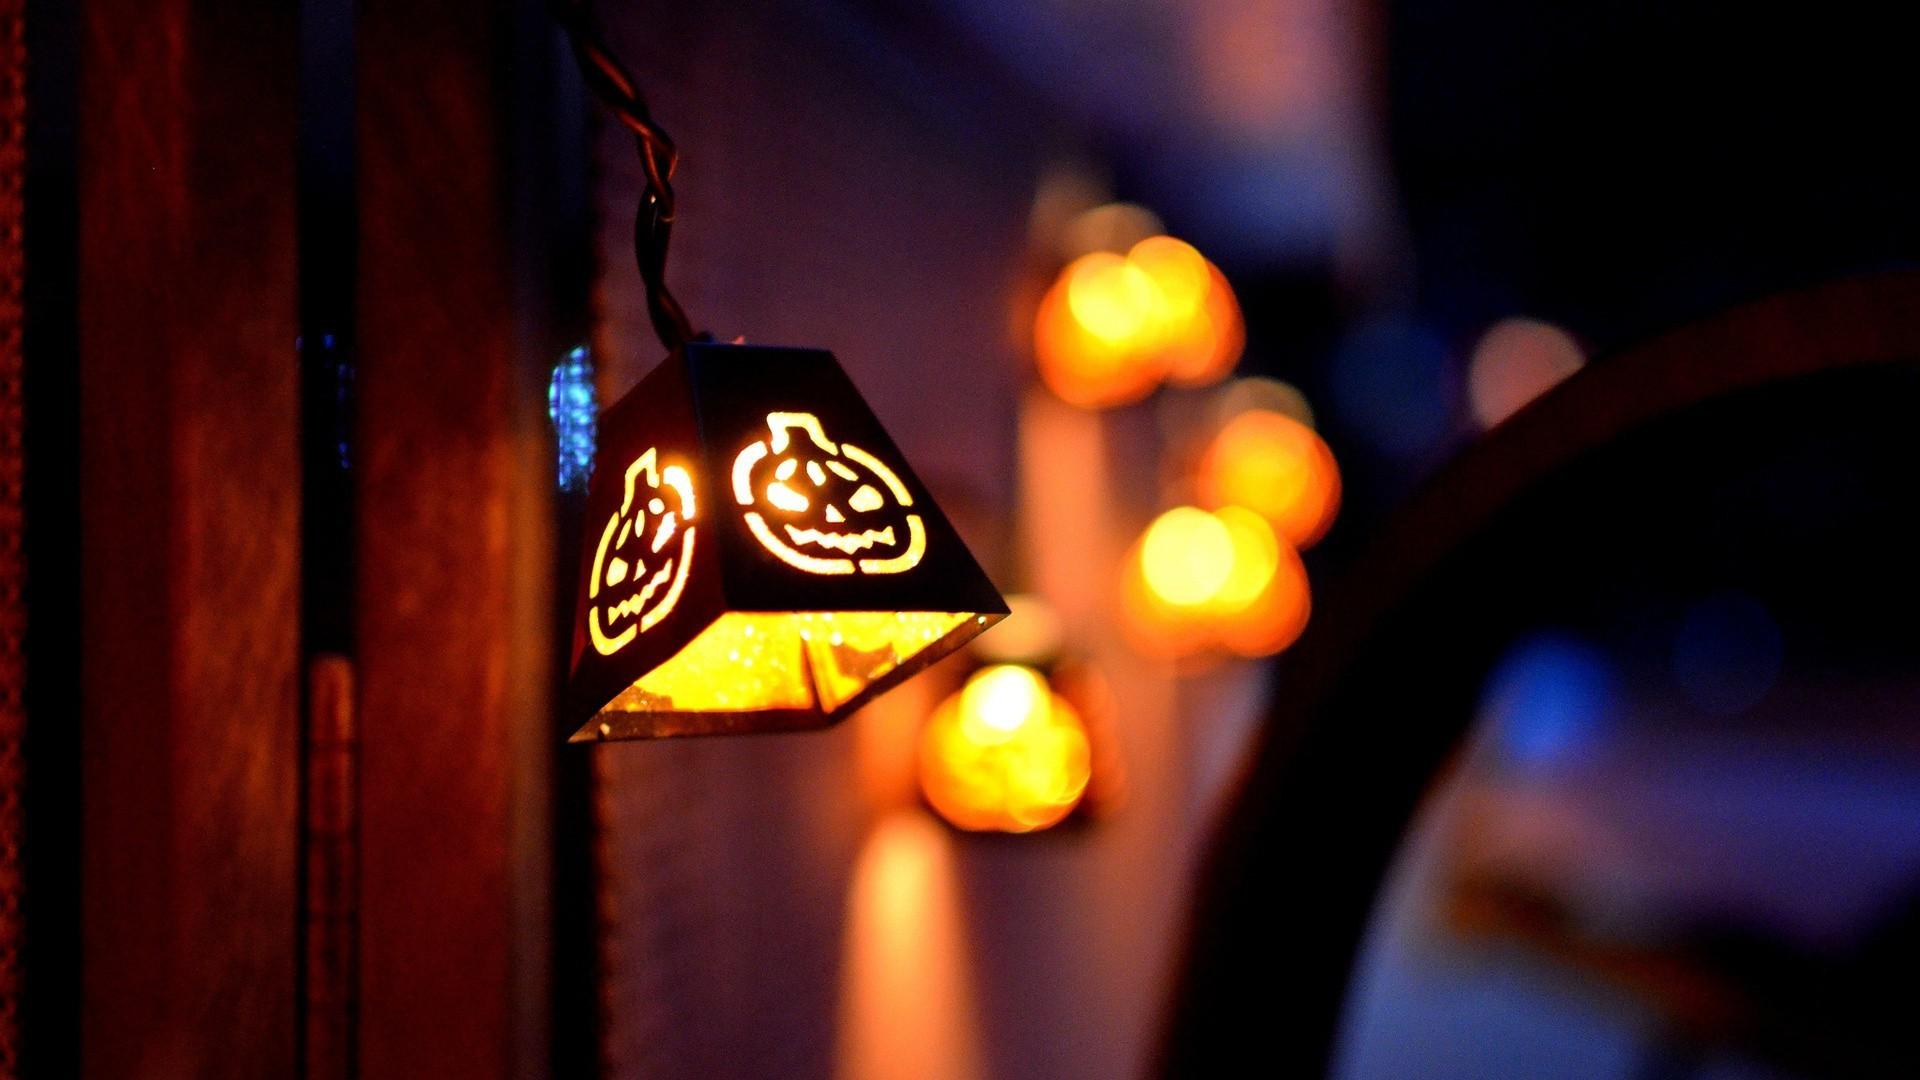 Beautiful Wallpaper Halloween Light - 11215762090404826424  You Should Have_988916.jpg